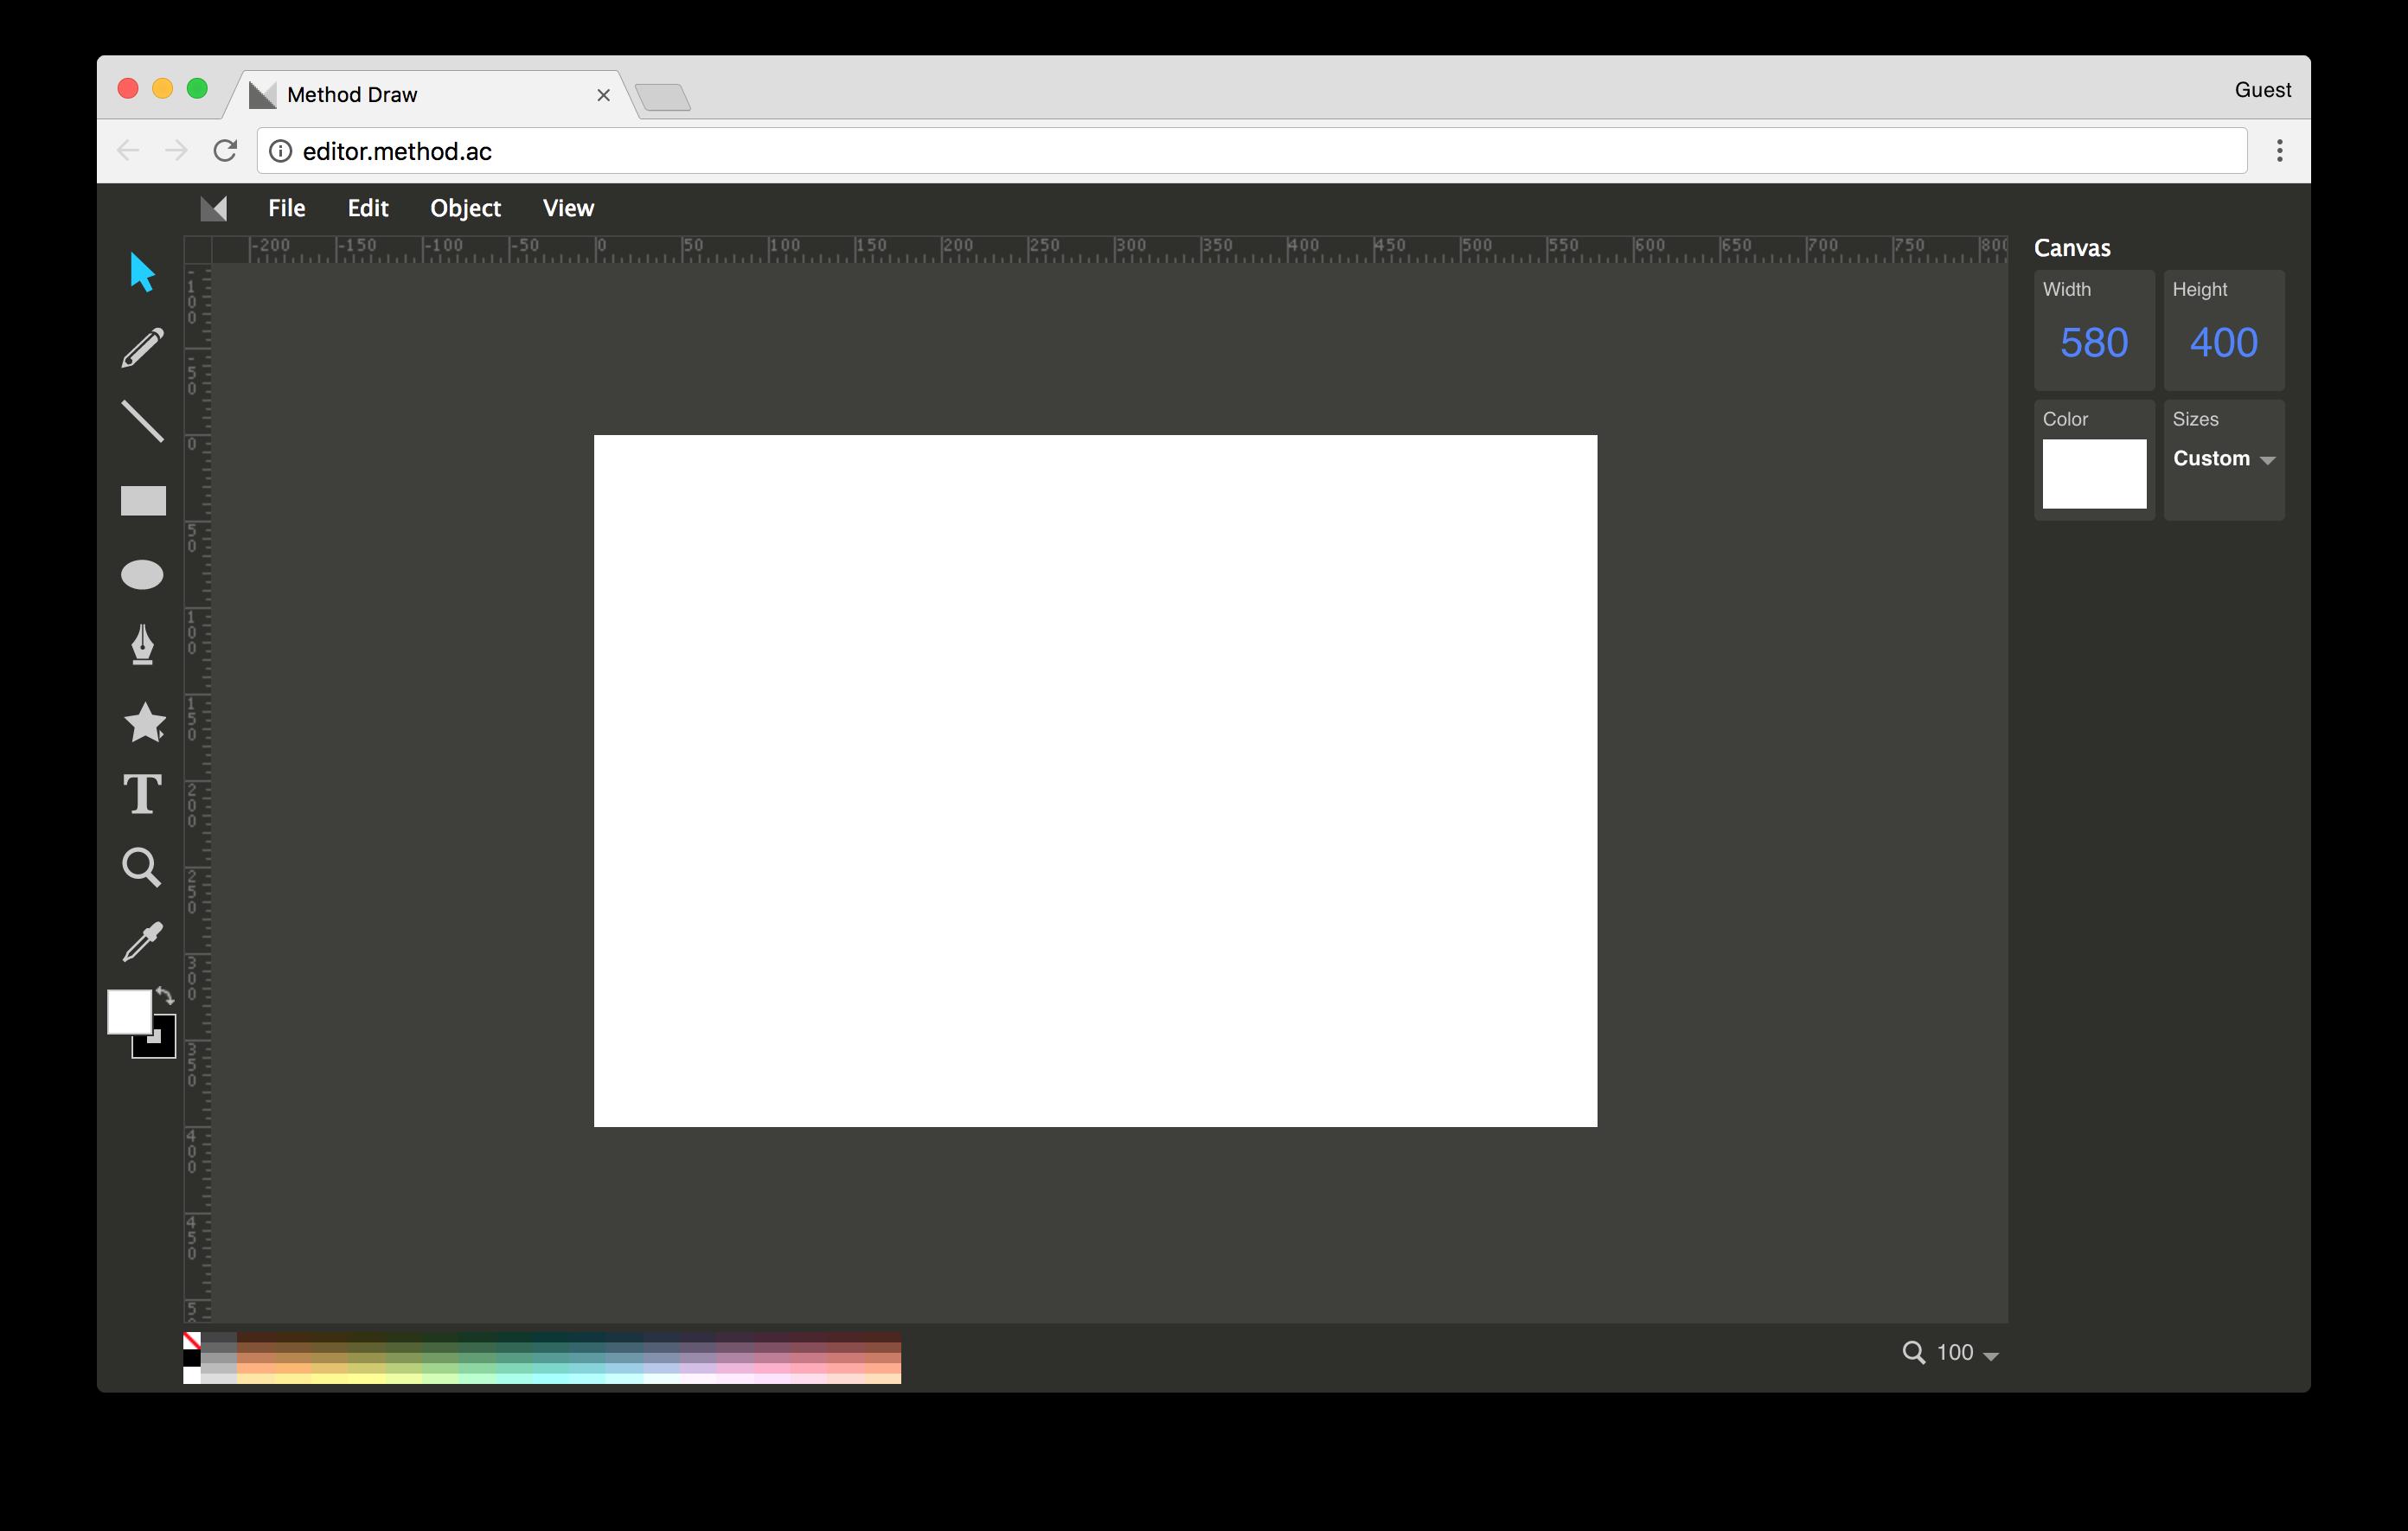 editor.method.ac